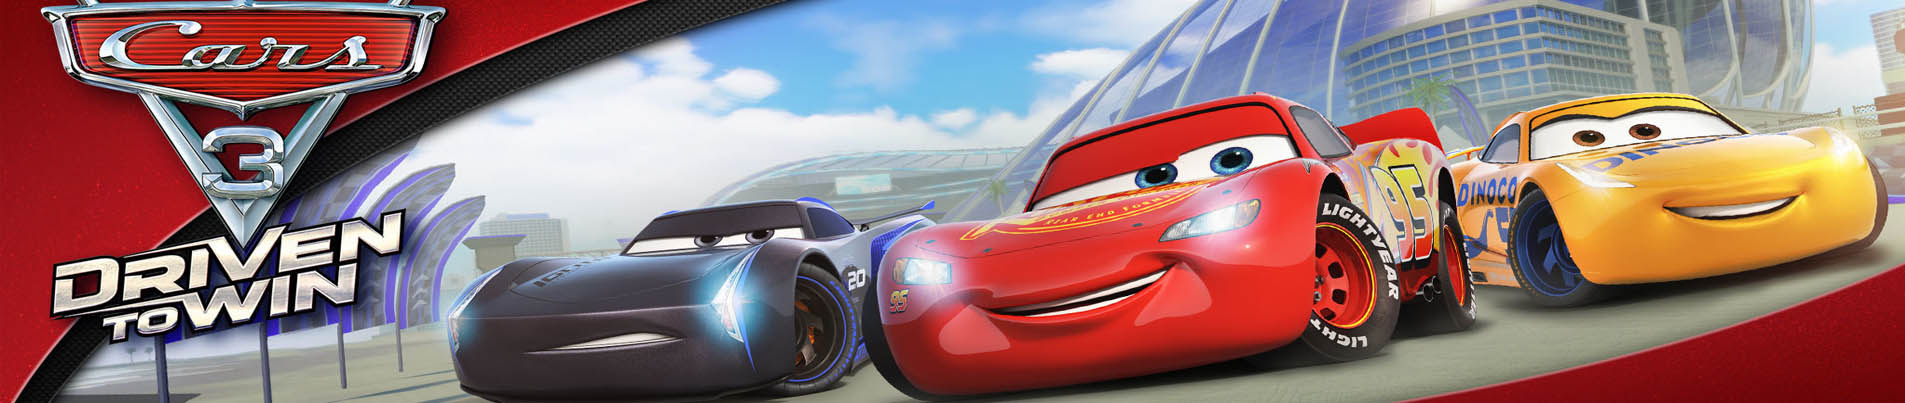 Cars 3 Disney.